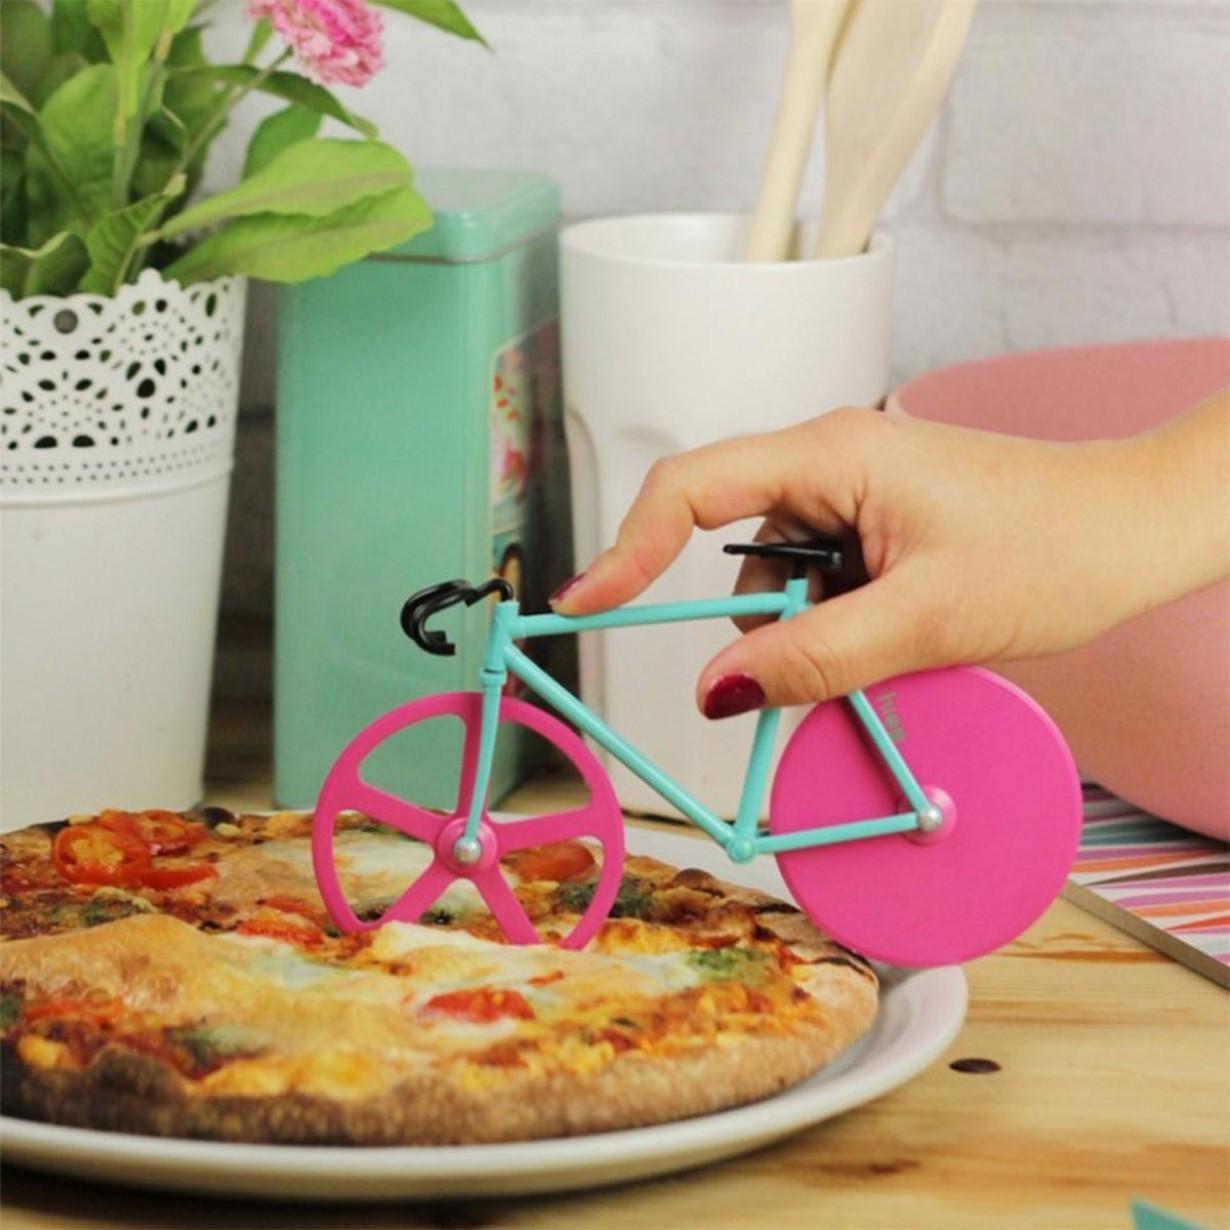 fahrrad-pizzaschneider-04e